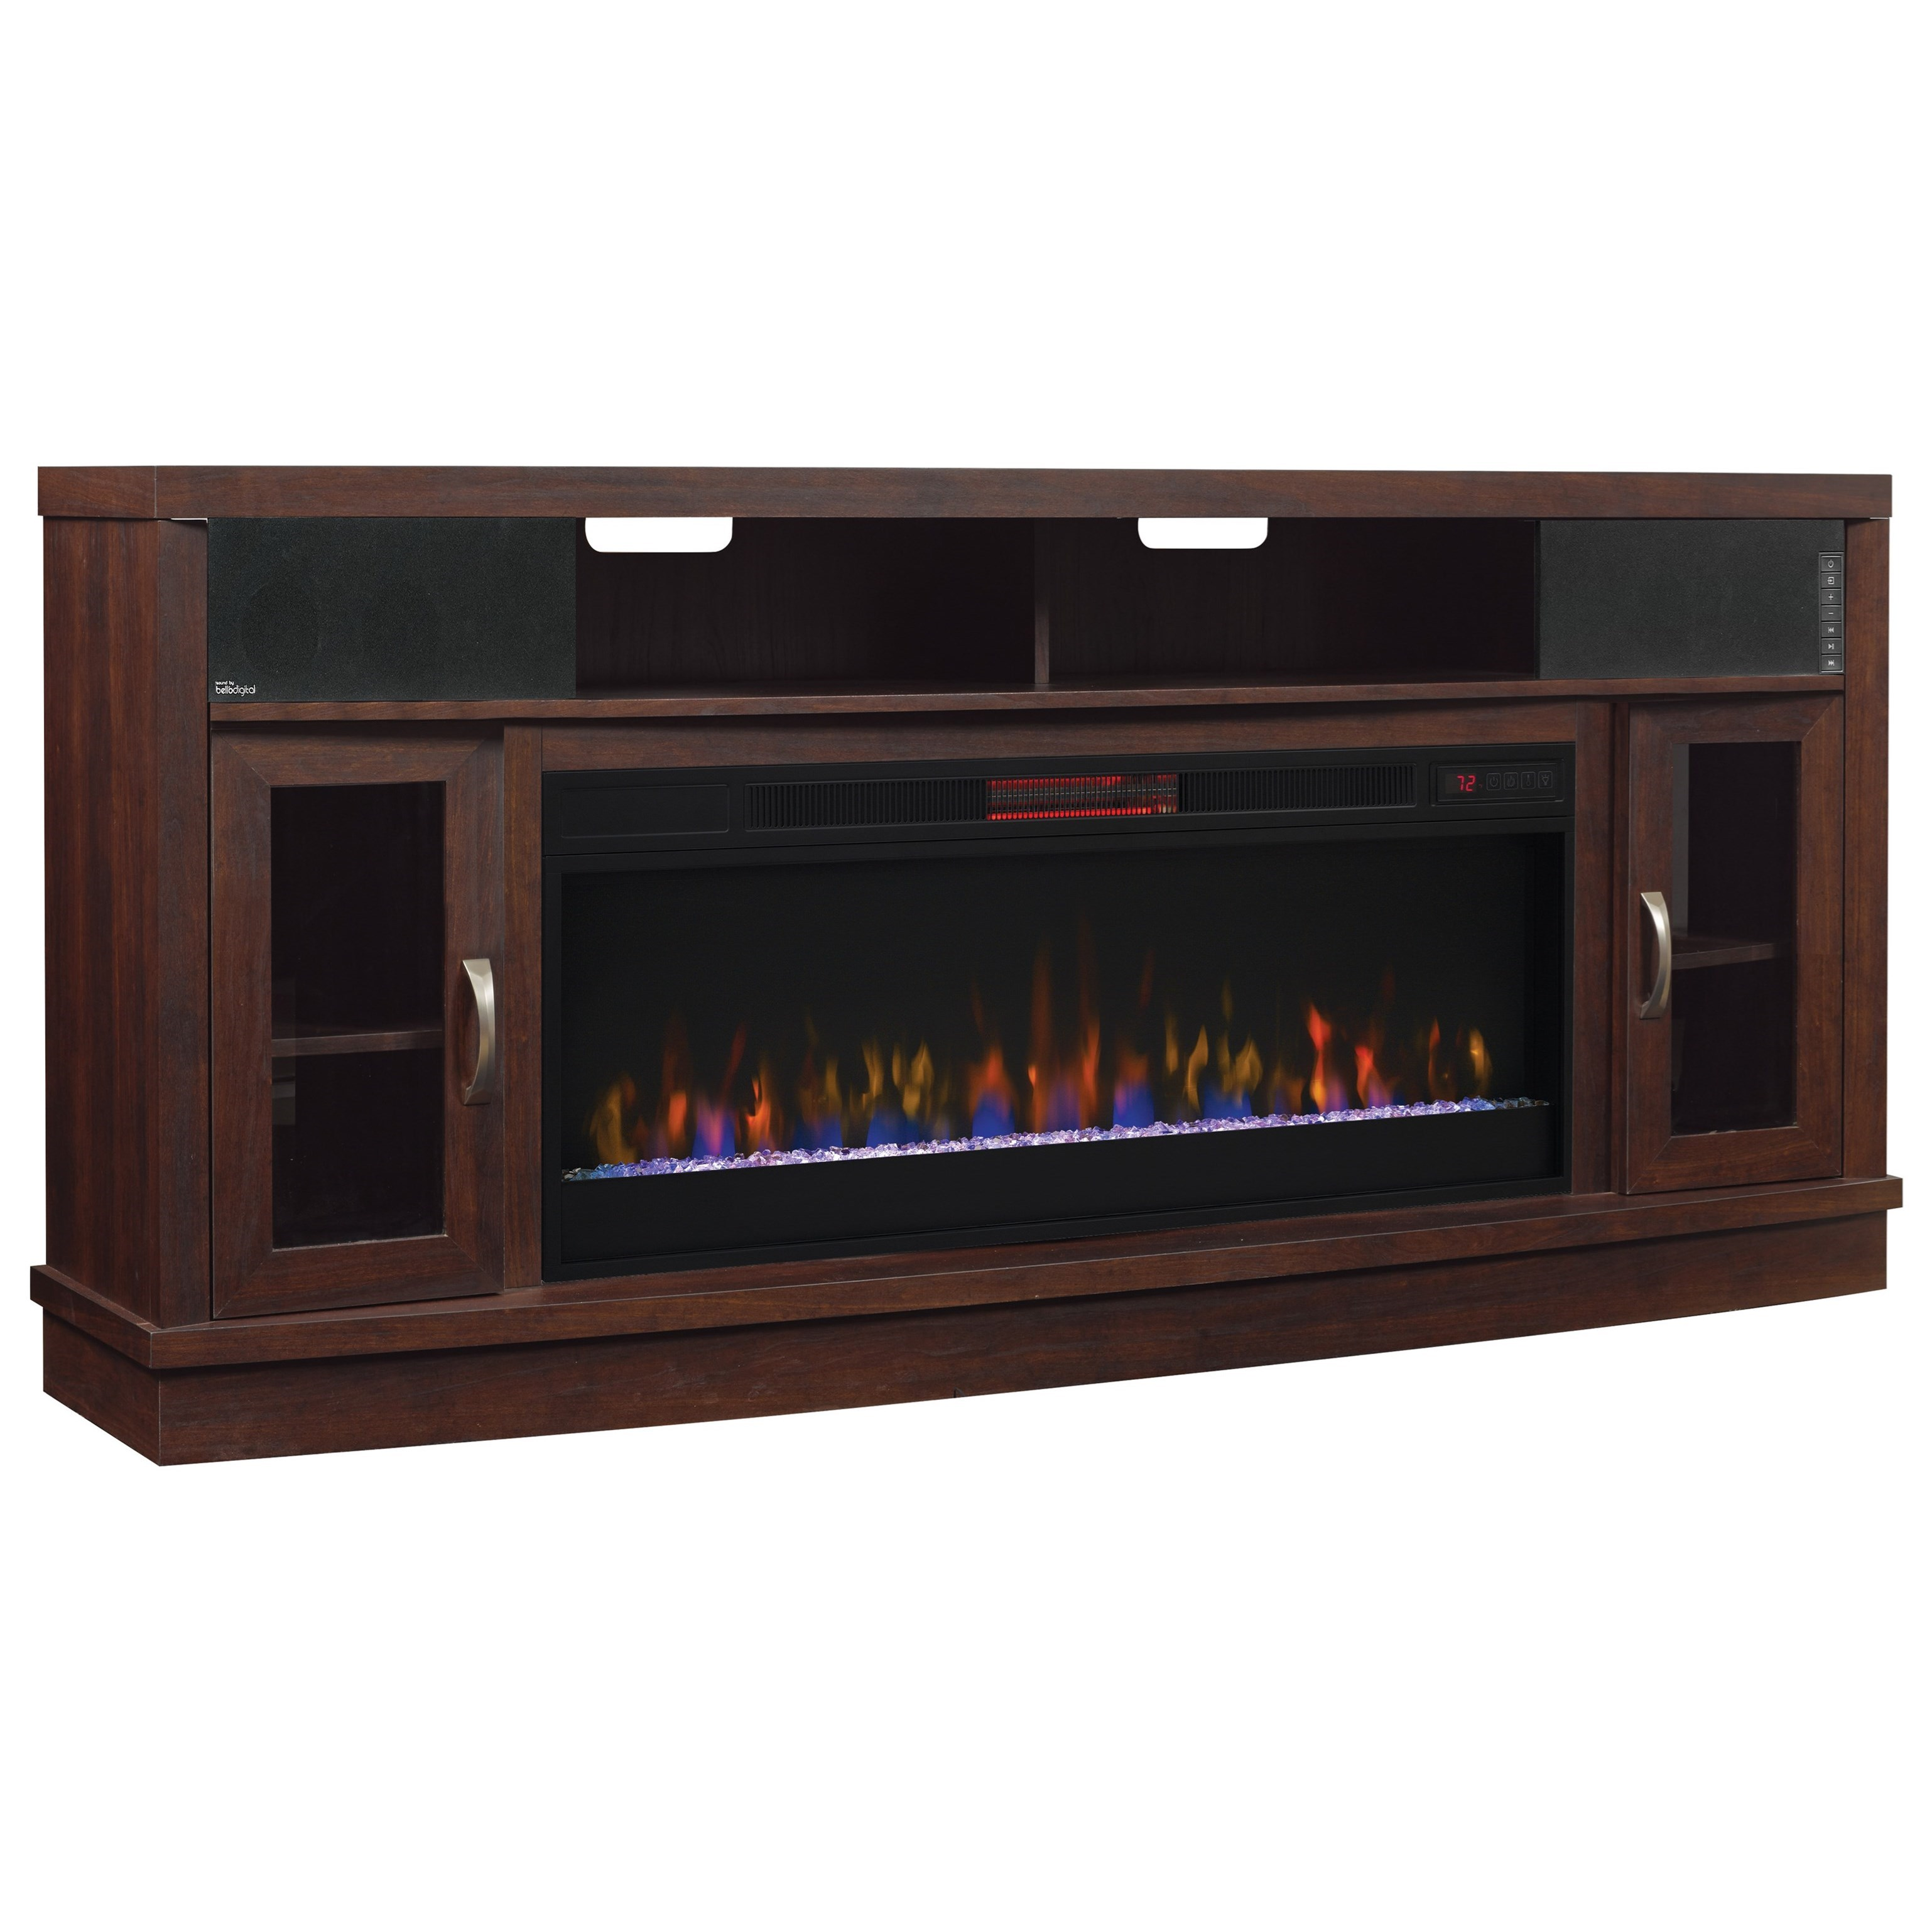 Deerfield Media Mantel Fireplace With Speakers at Sadler's Home Furnishings